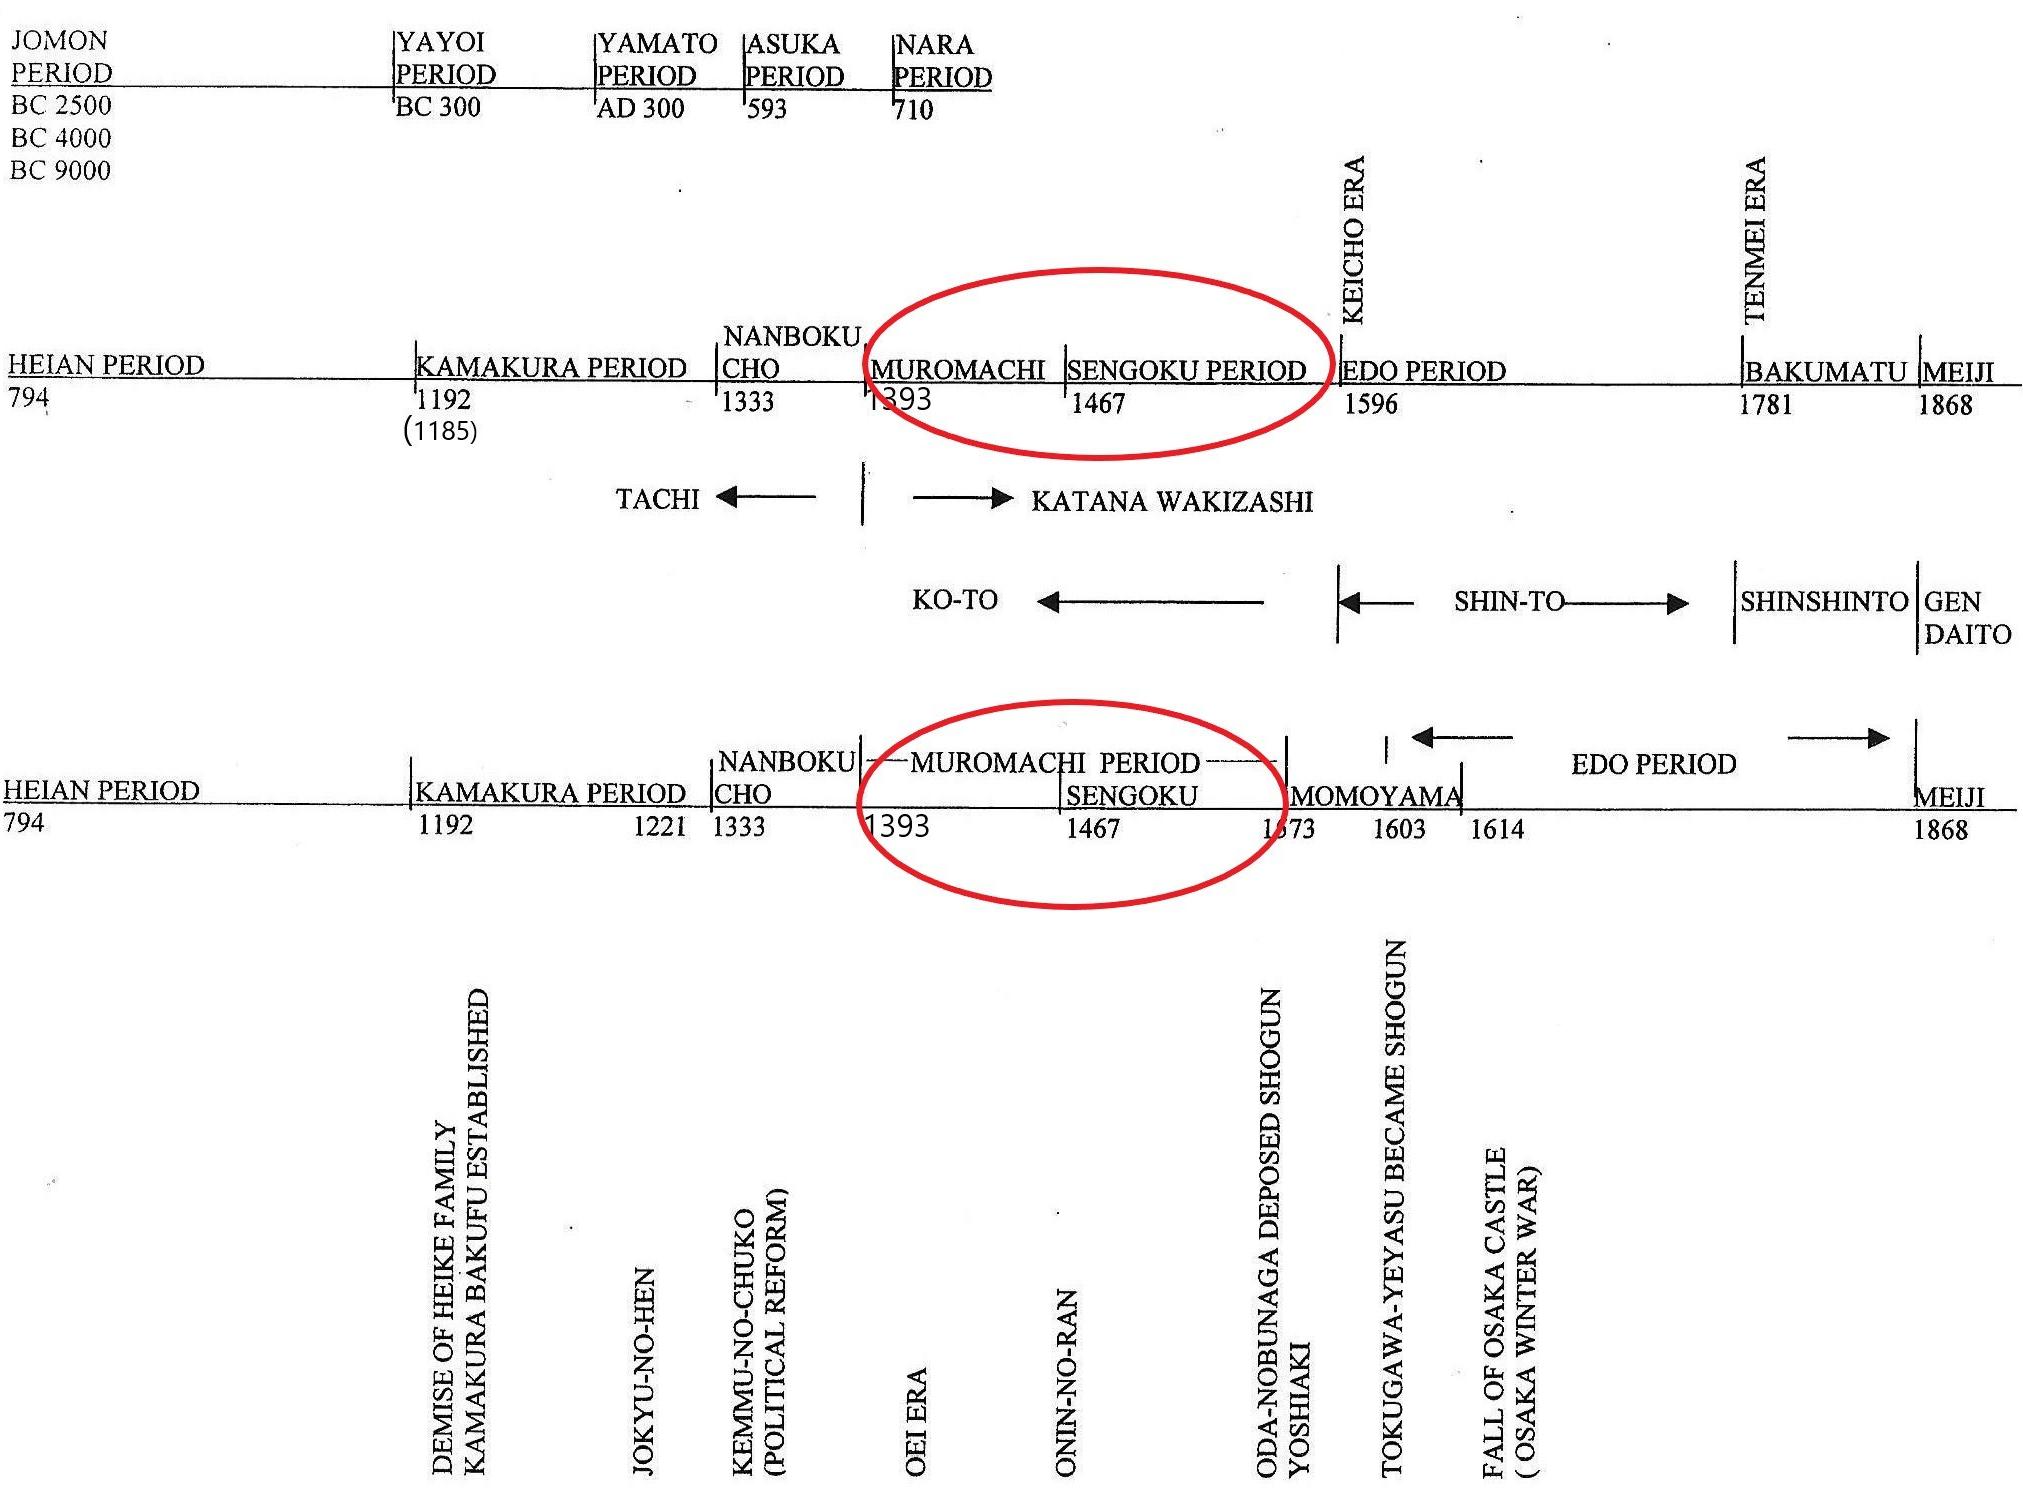 0-timeline - size 24 Nuromach & Sengoku